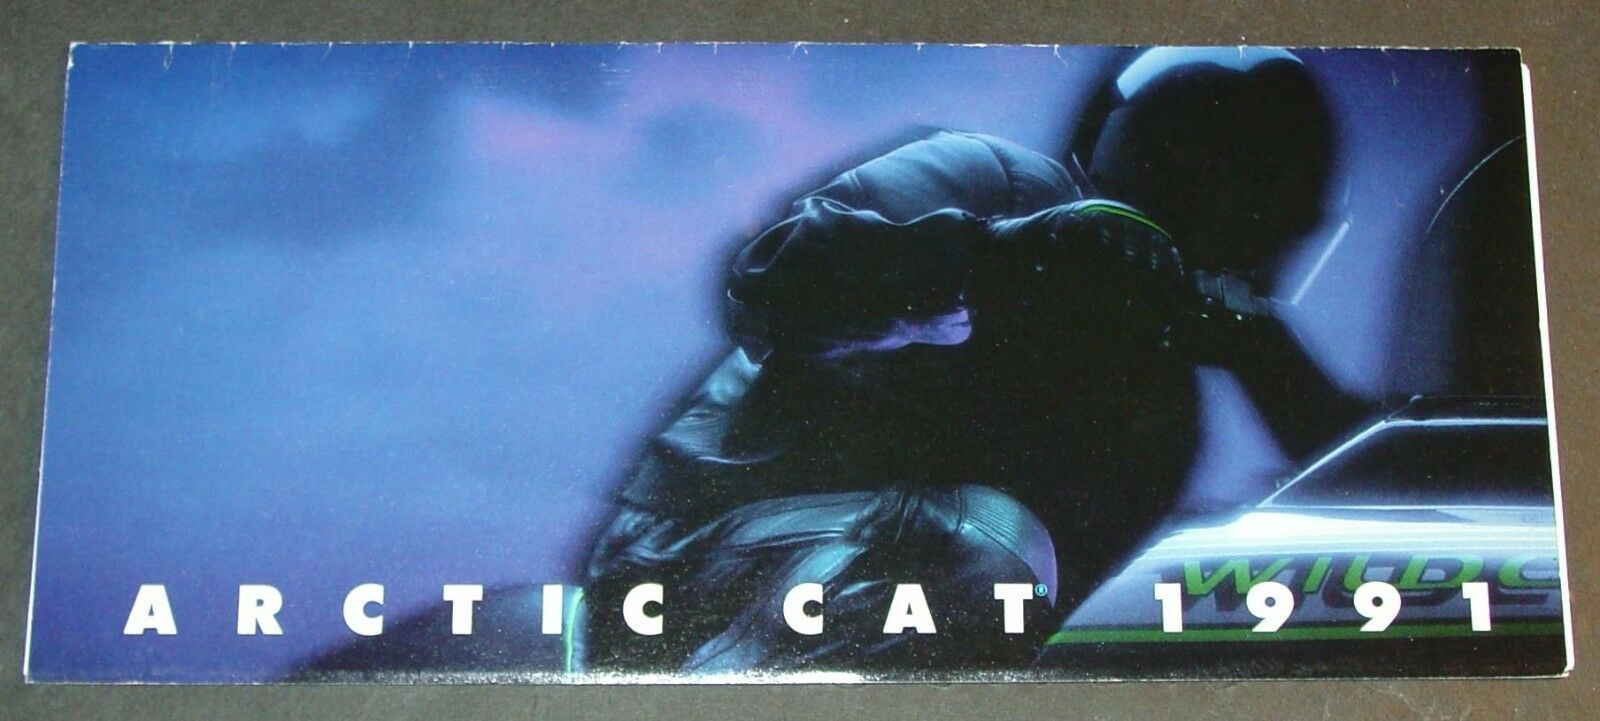 1991 ARCTIC CAT SNOWMOBILE FULL LINE SALES BROCHURE 4  x 8 1 2   NICE   (040)